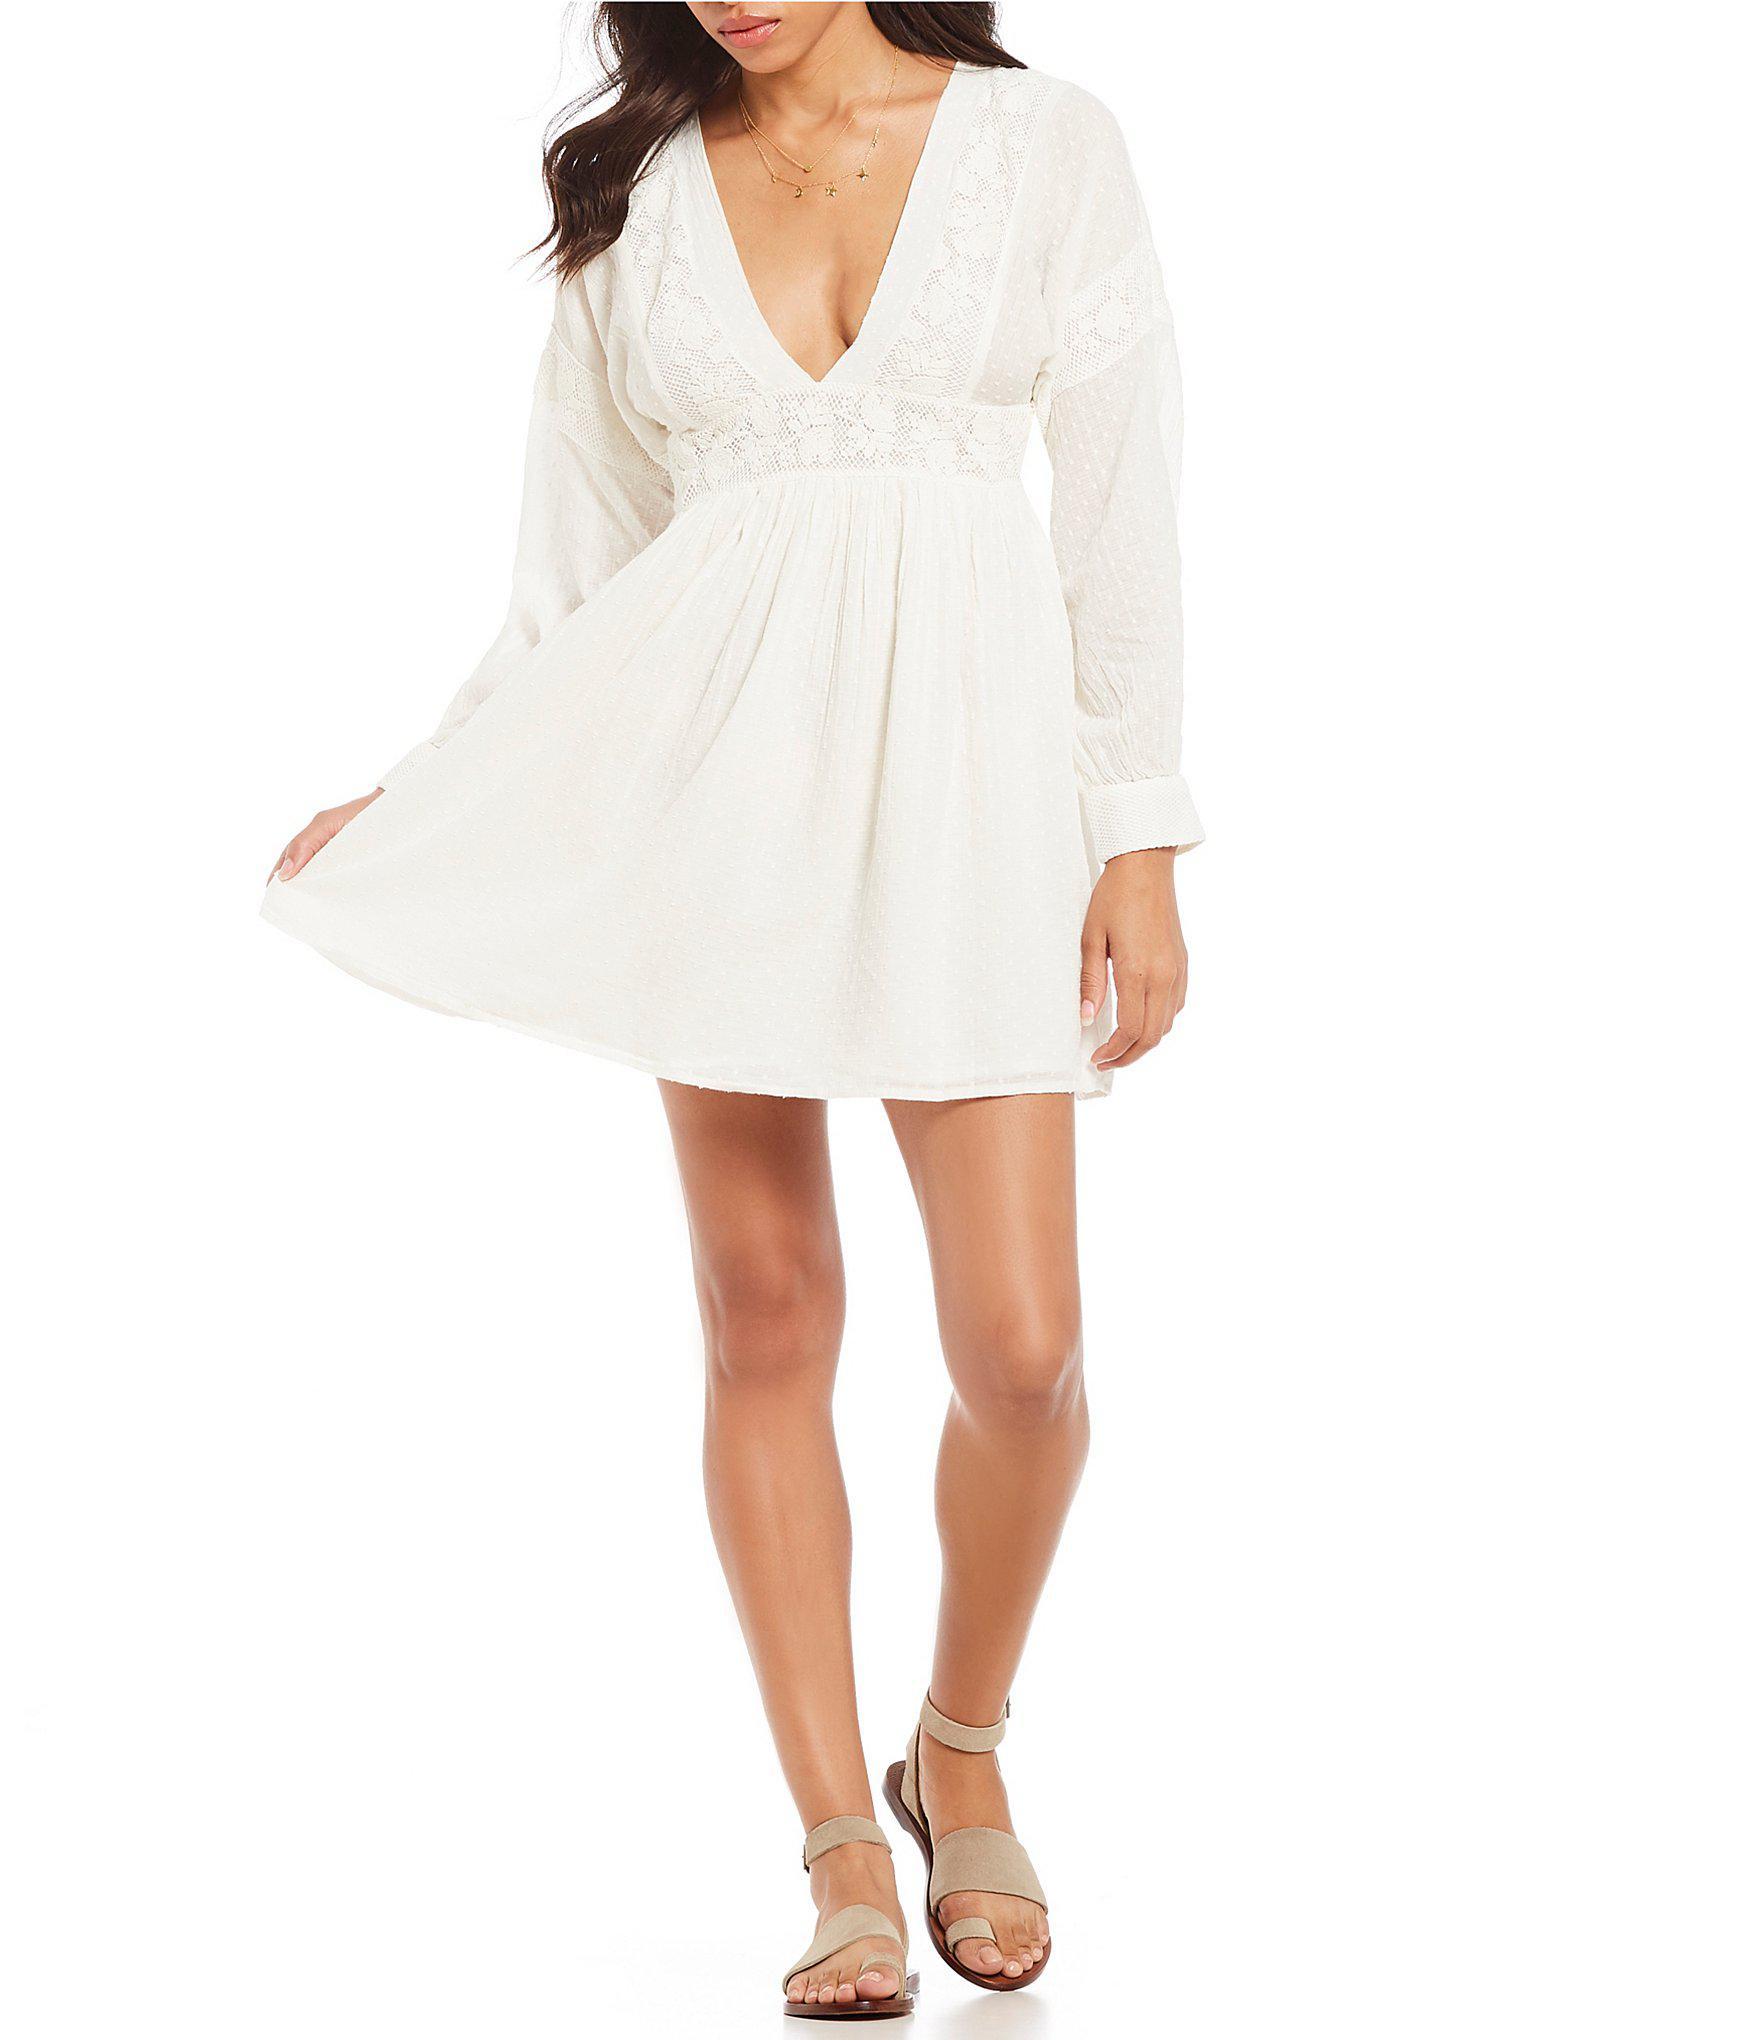 bae52c62207b Free People Sugarpie Embroidered Prairie Mini Dress in White - Lyst